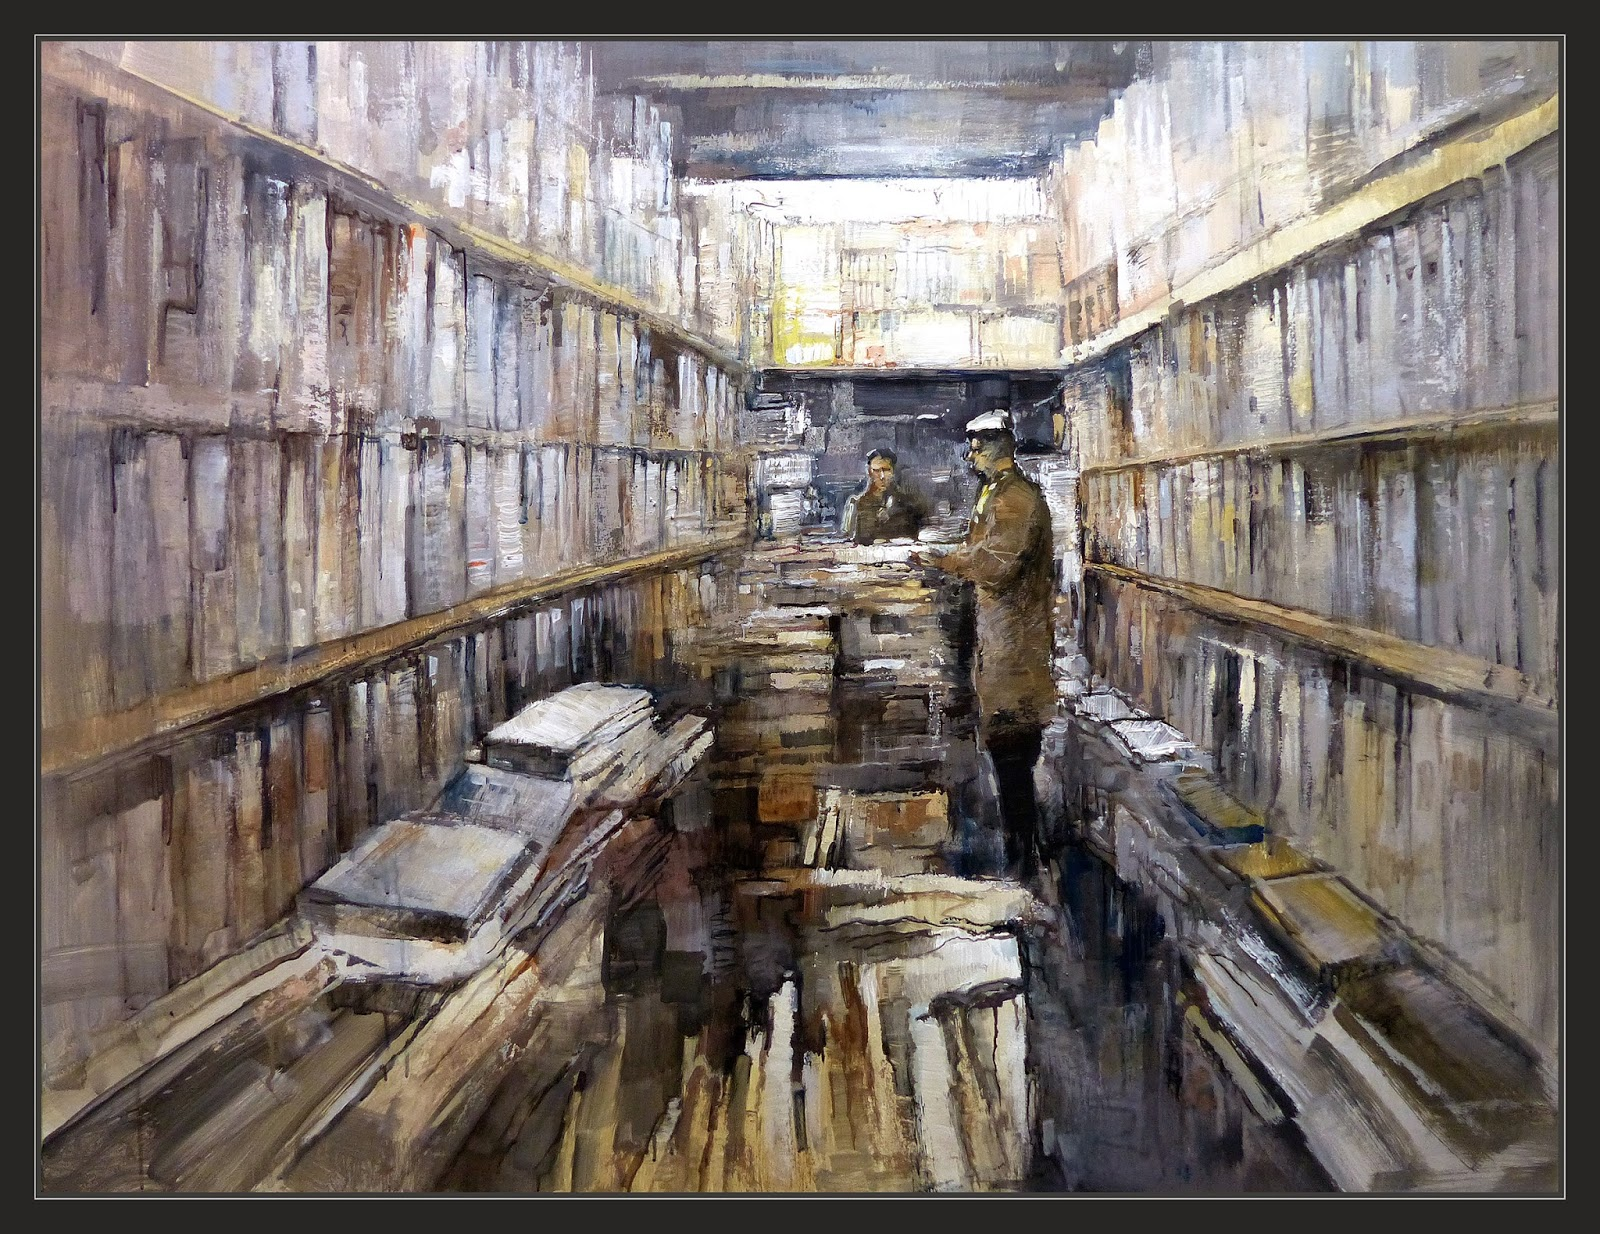 Ernest descals artista pintor librerias pintura tiendas for Cuadros de interiores